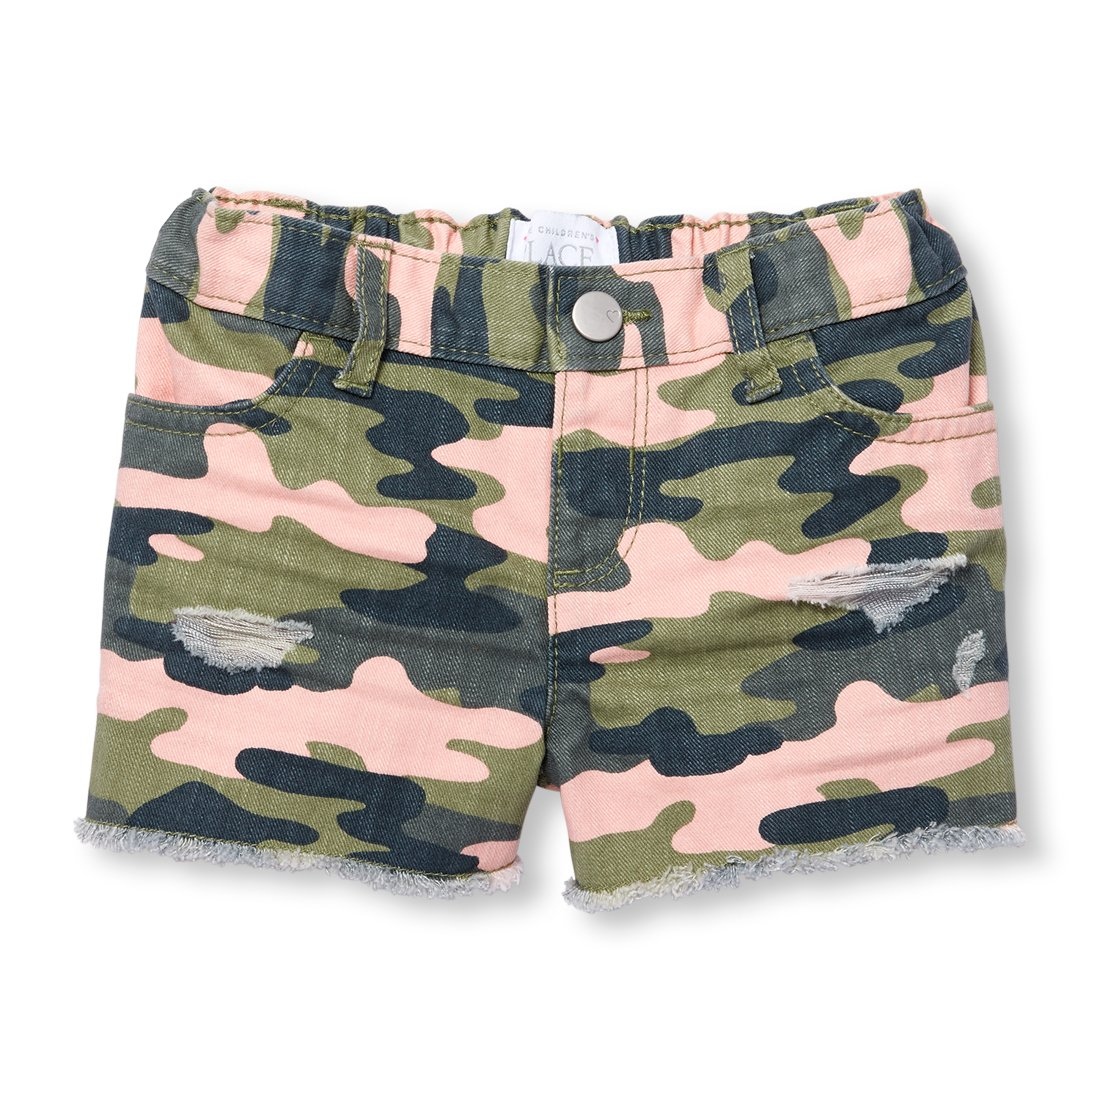 The Children's Place Baby Girls Denim Shorts, Desertpnk 09182, 2T